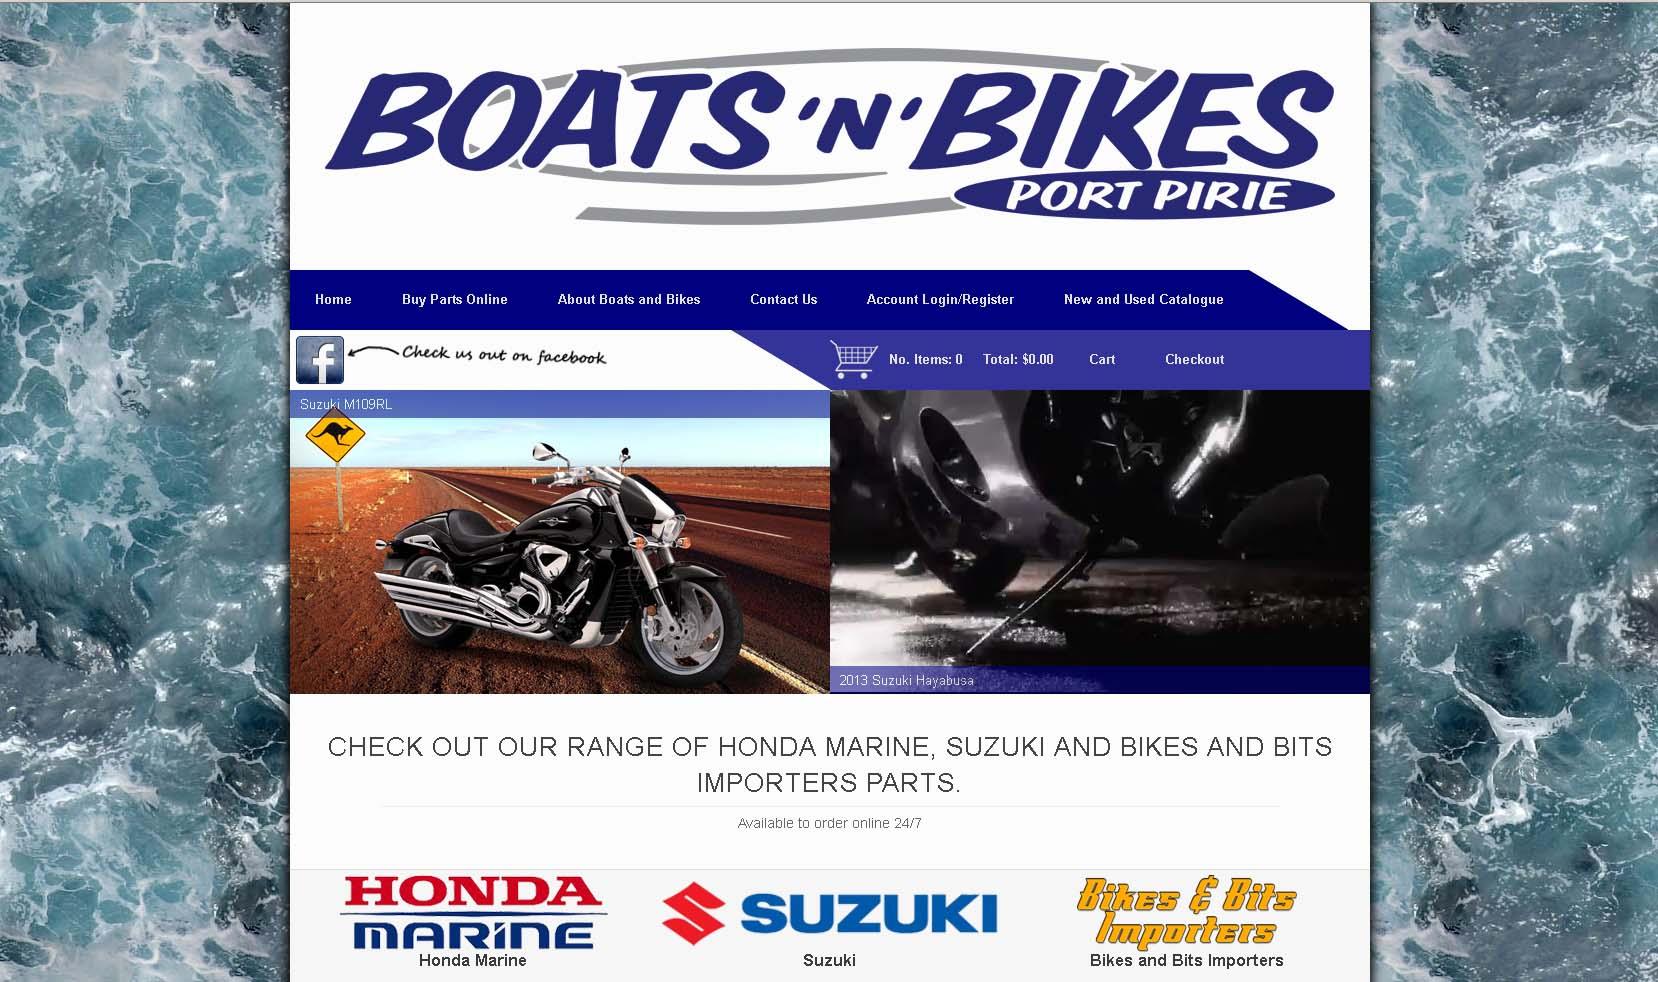 Boats Bikes Website Screenshot